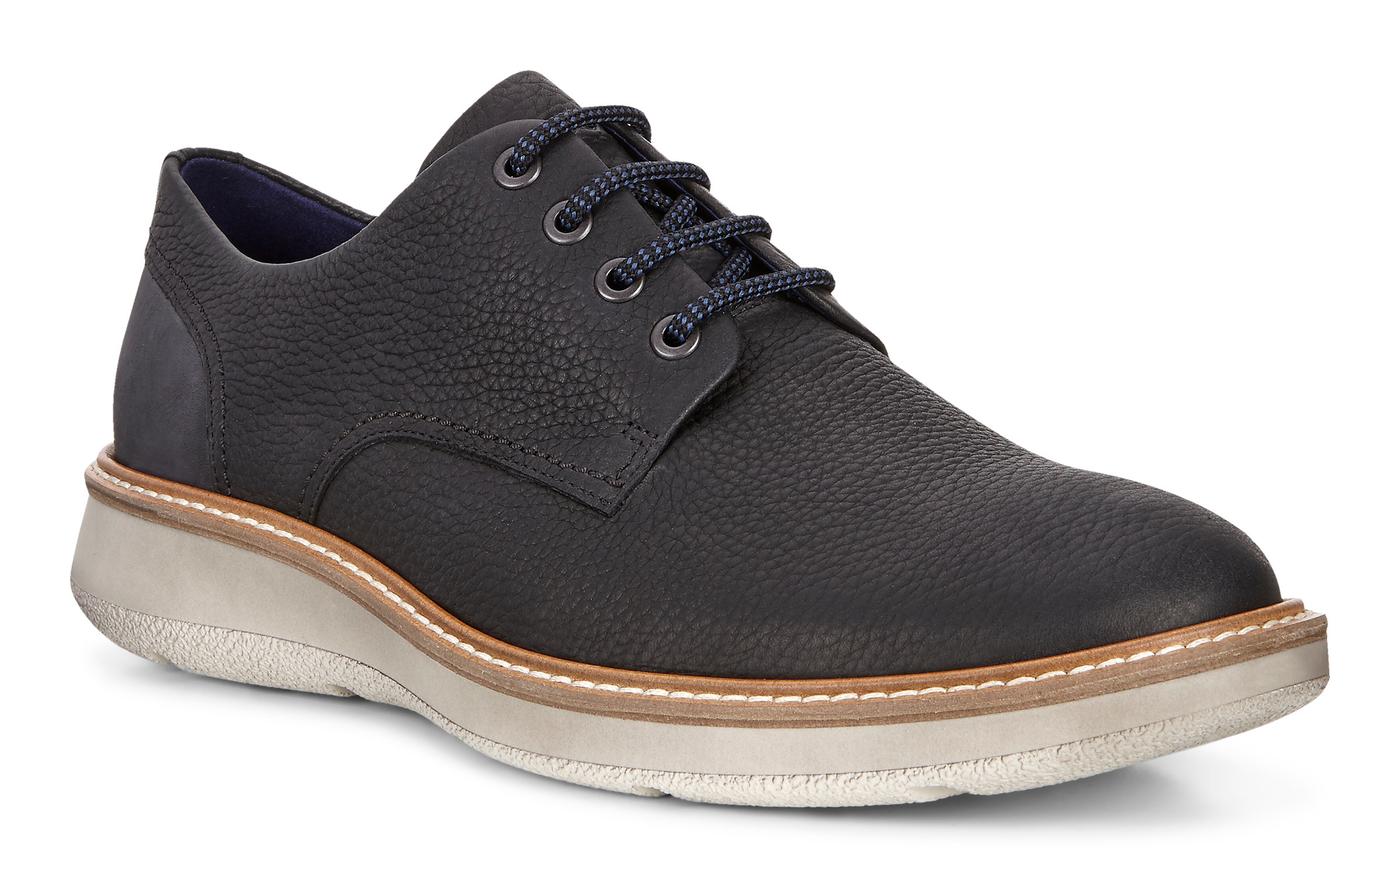 saada uutta säästää jopa 80% kenkäkauppa ECCO Aurora Tie | Men's Shoes | ECCO® Shoes